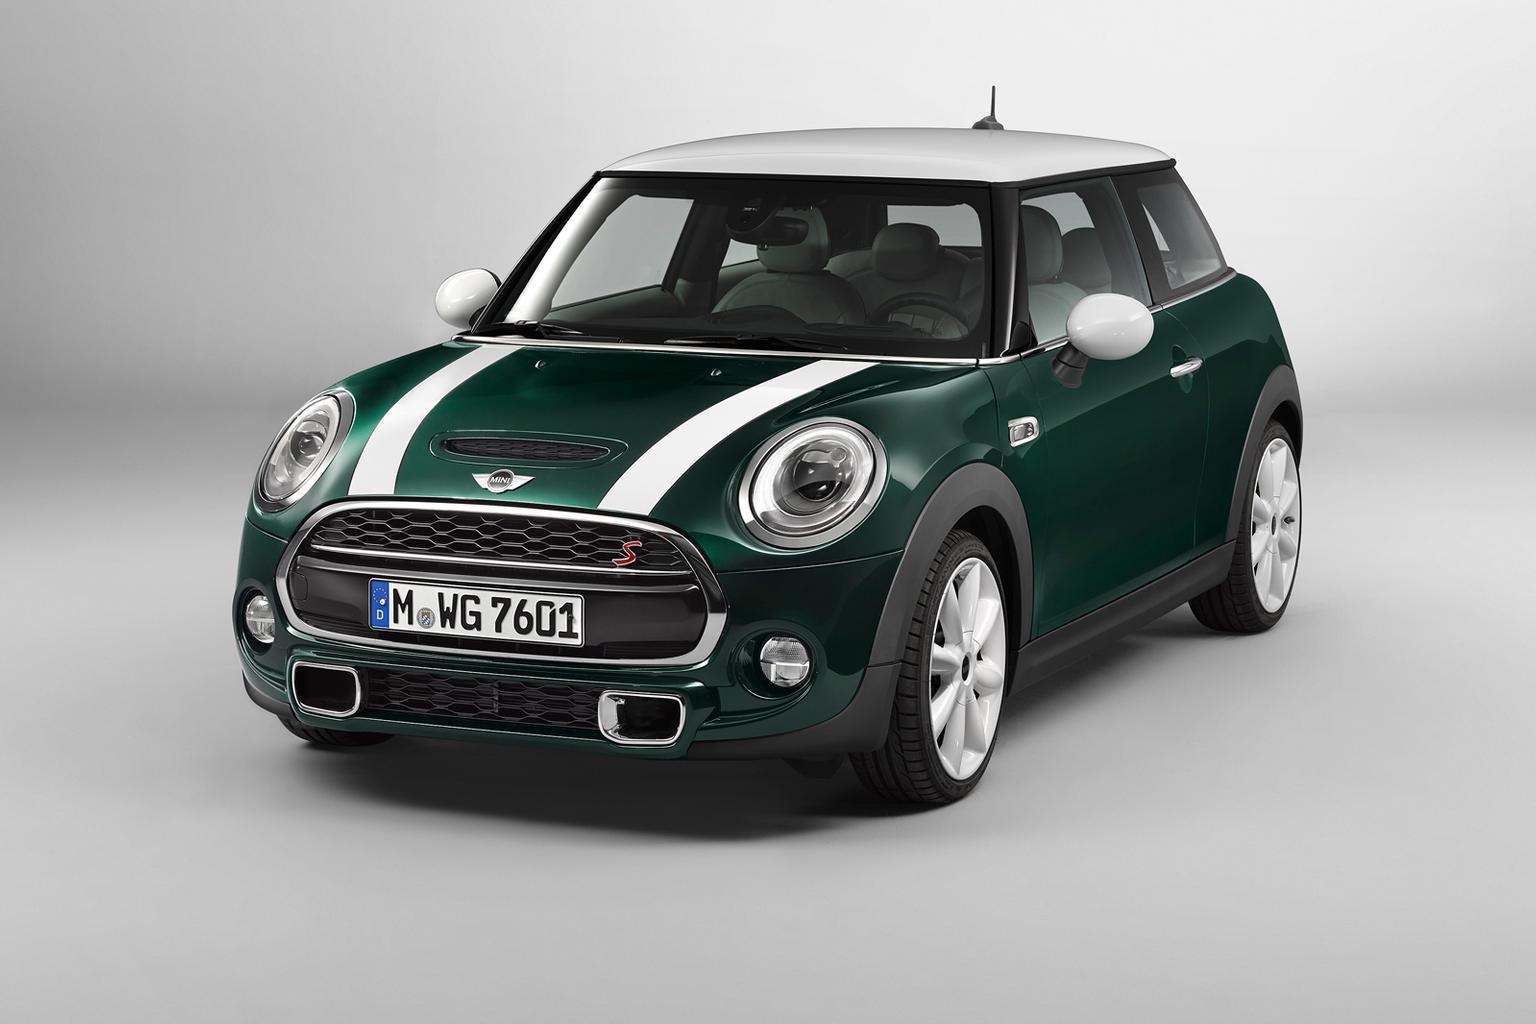 2014 Mini Cooper SD revealed